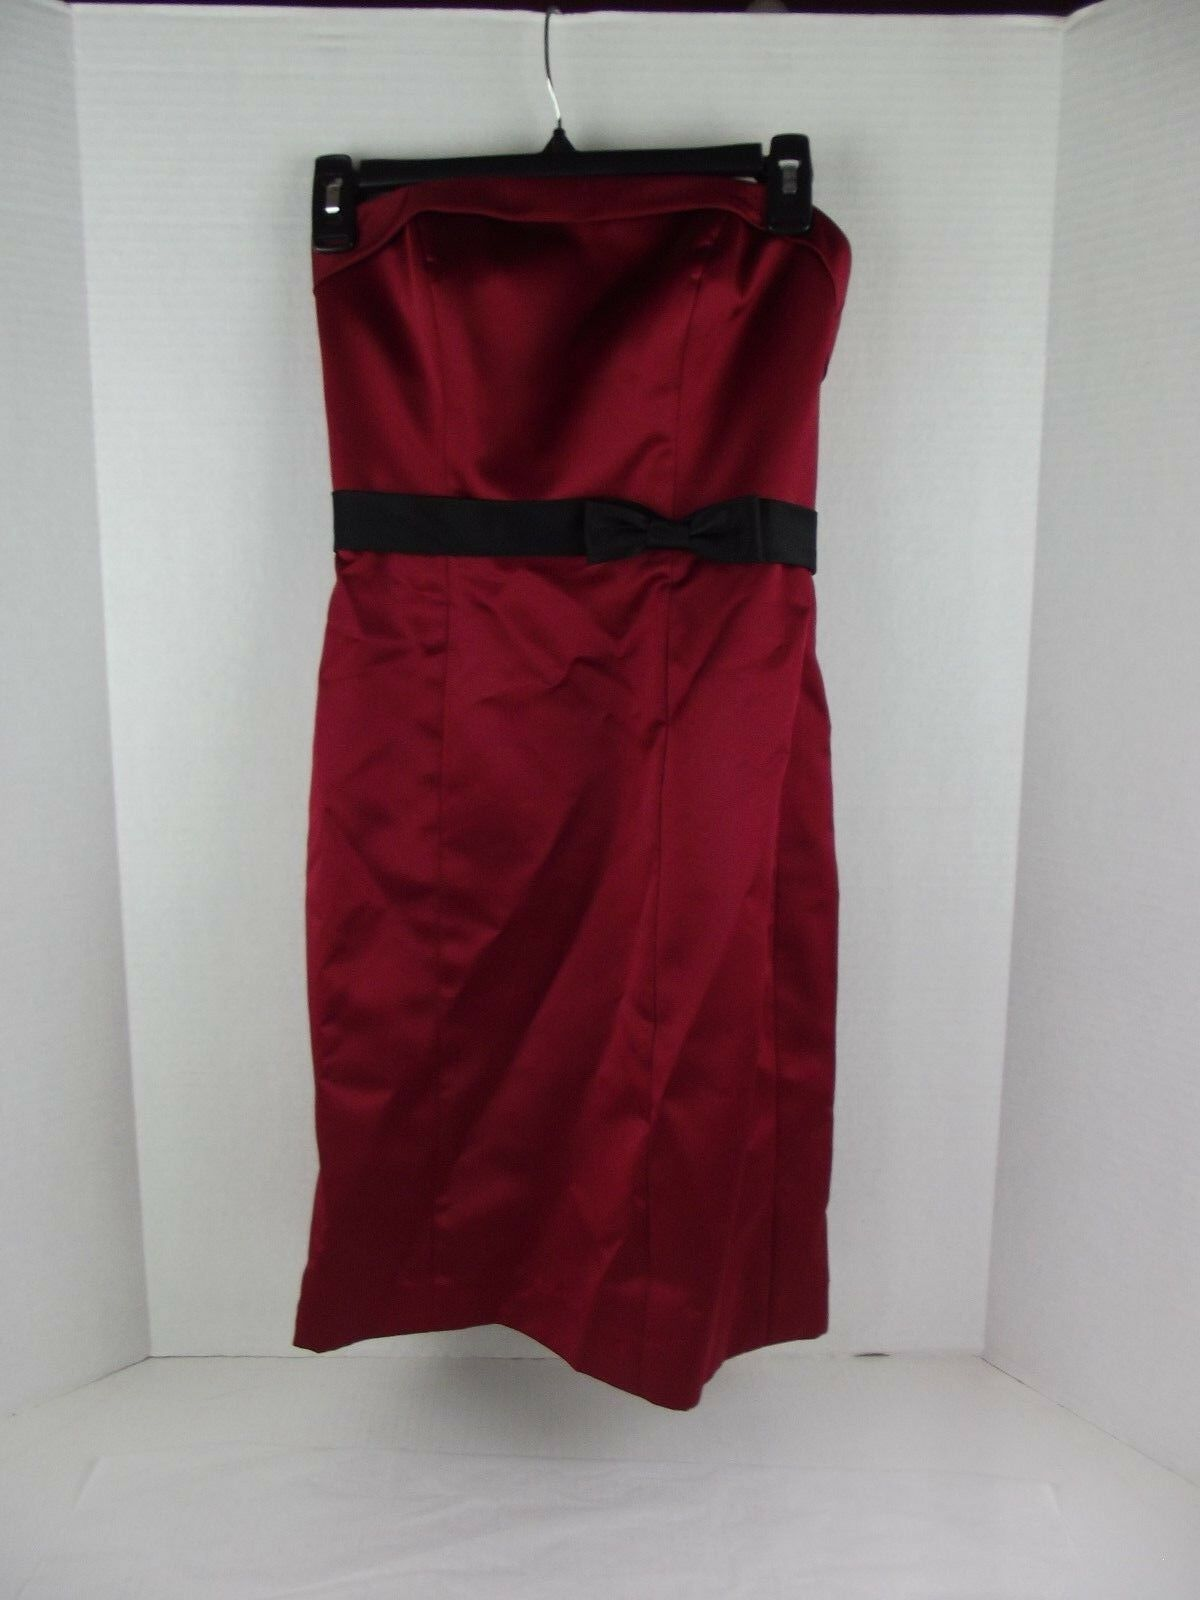 Alfrot Angelo Bridesmaid Dress LB-FE3026 RN 24766 Woherren  Sz. 0